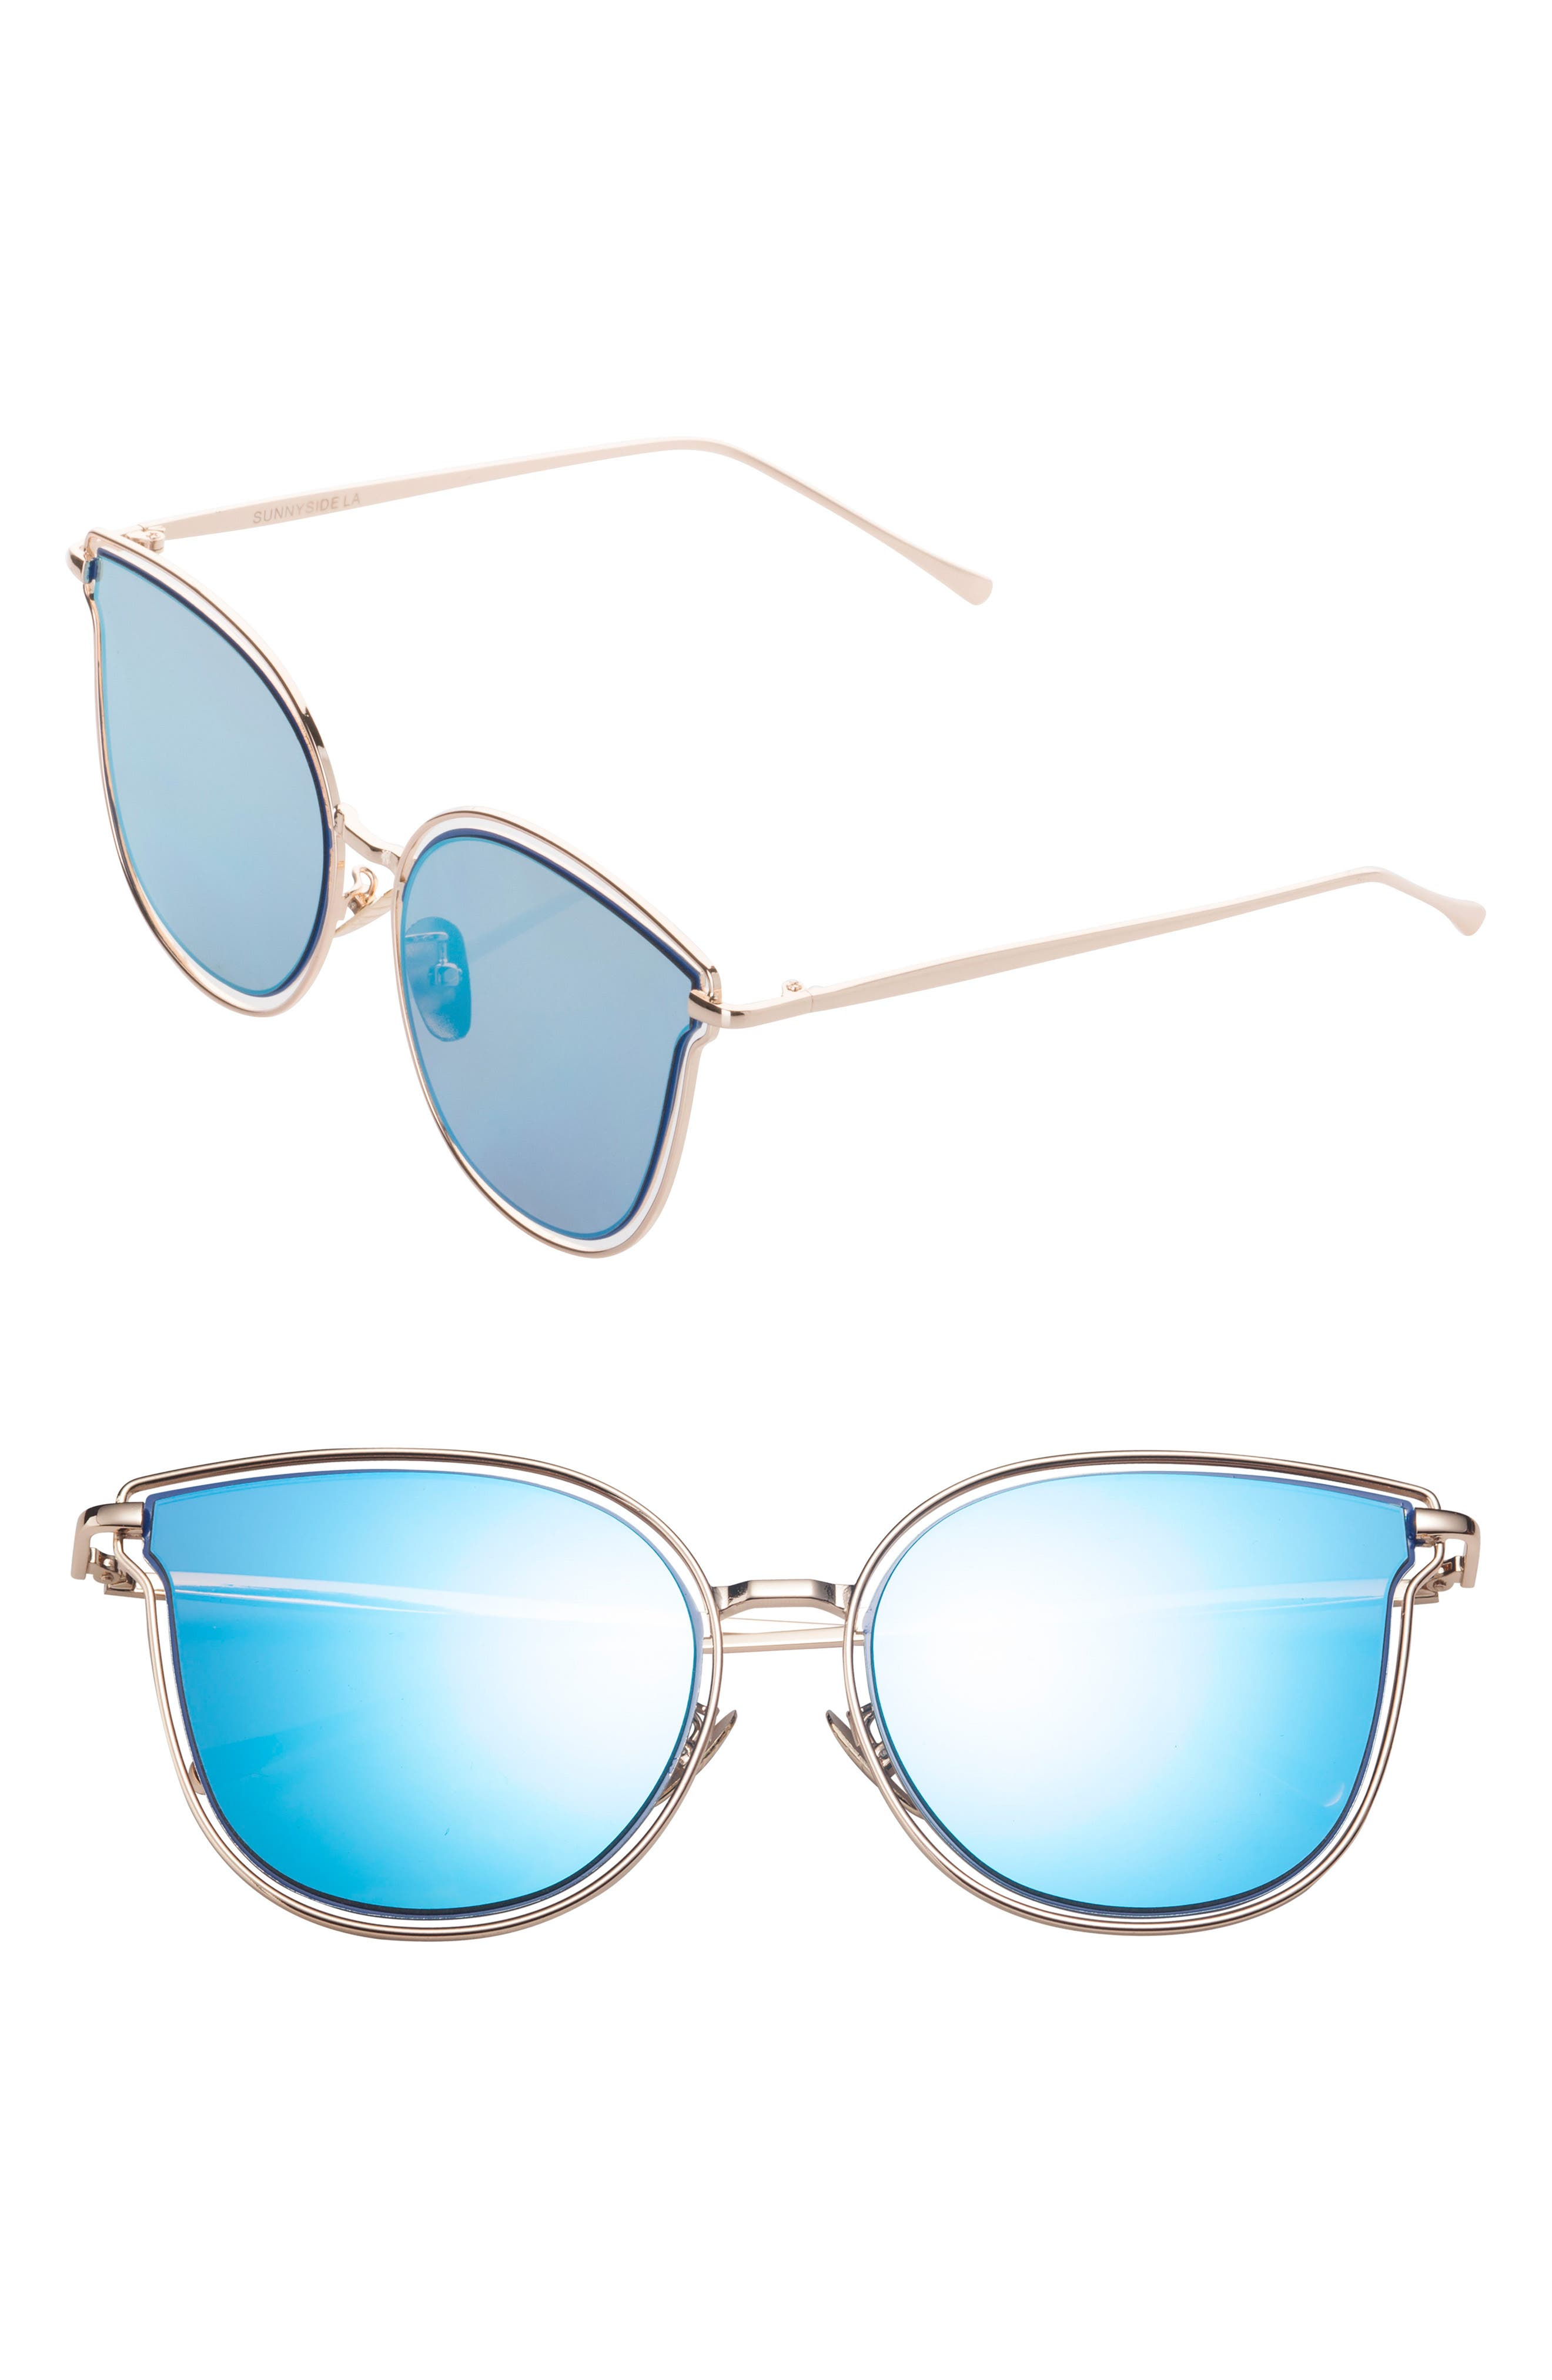 54mm Sunglasses,                             Main thumbnail 1, color,                             Blue/ Gold